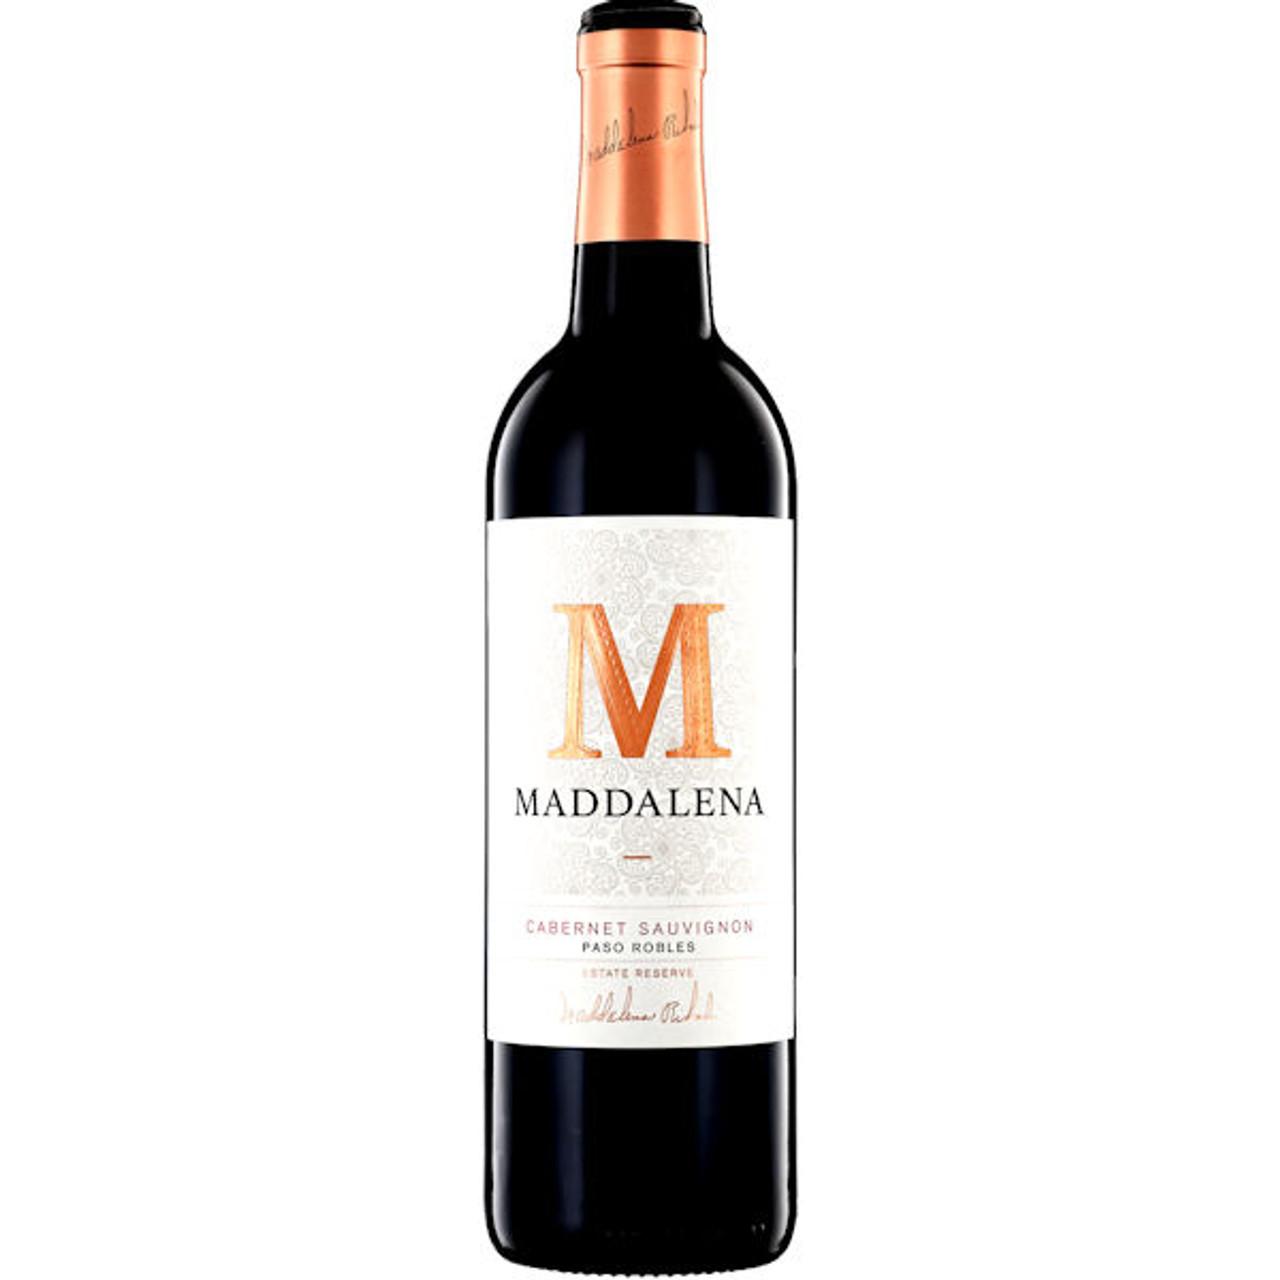 Maddalena Vineyard Paso Robles Cabernet